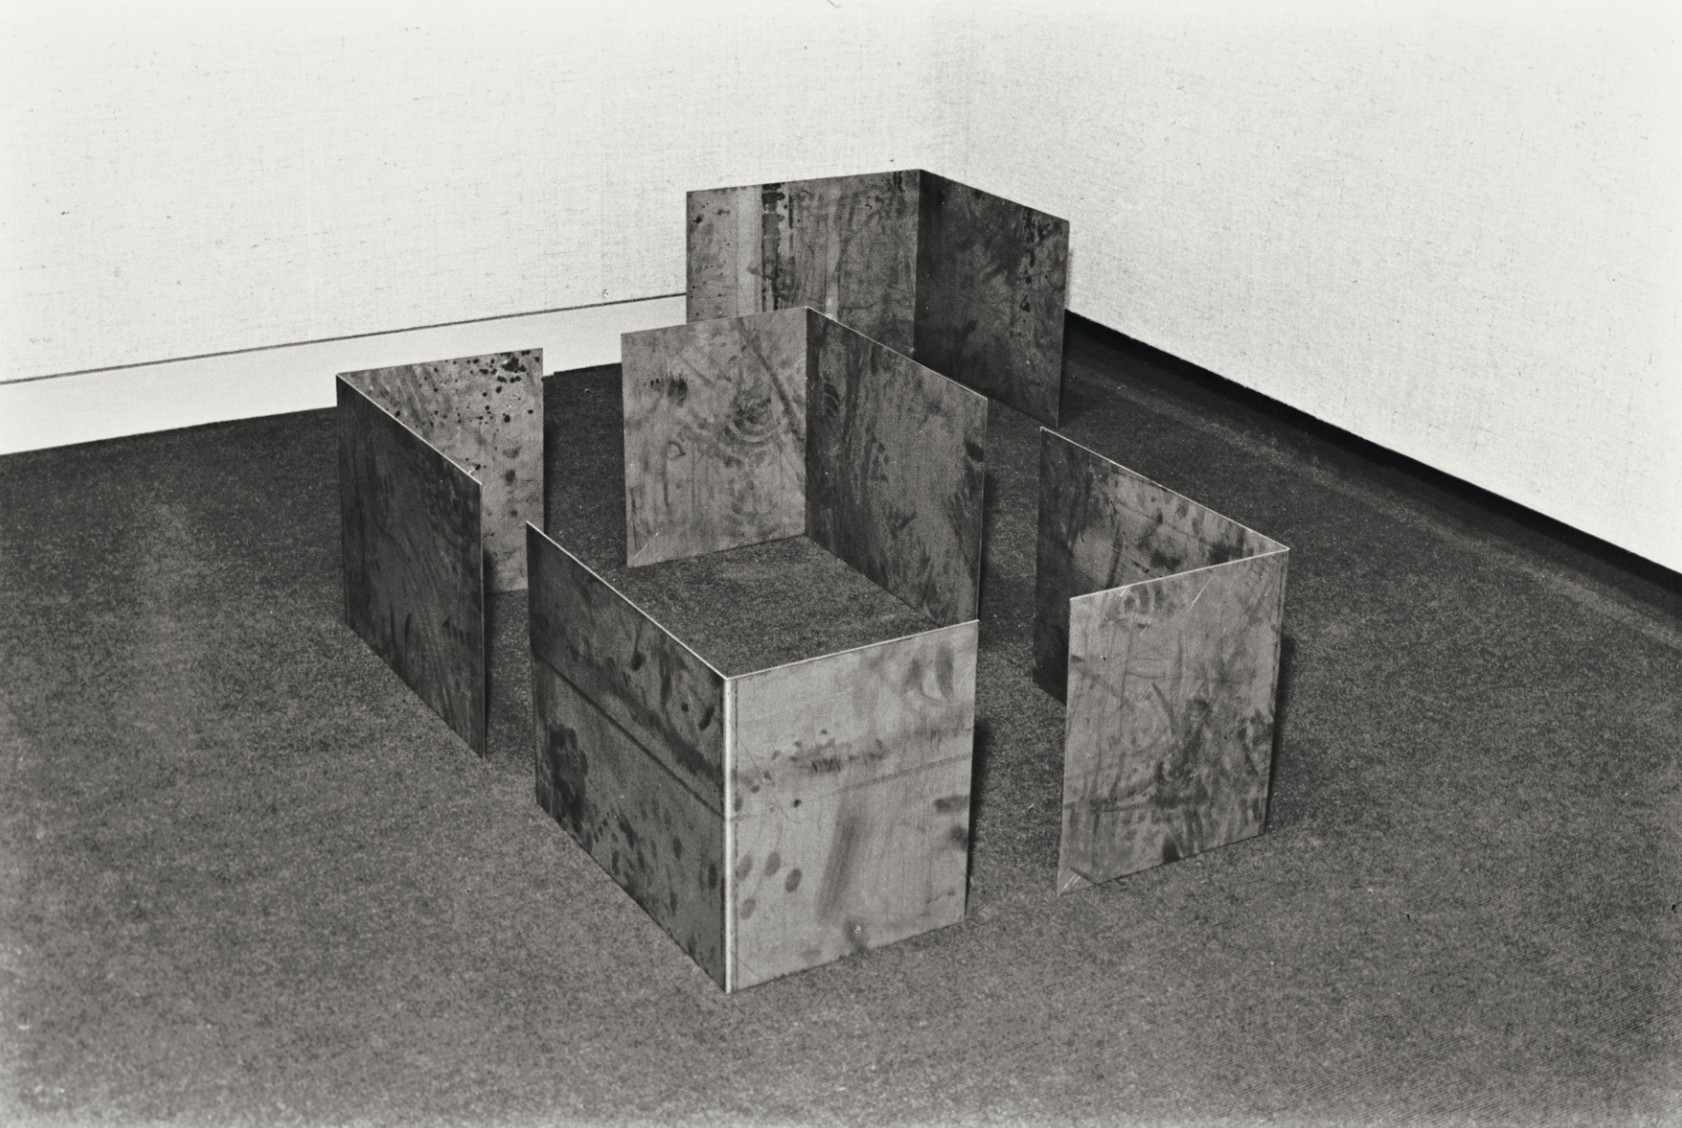 Lee Ufan,  Relatum , 1974. © Artists Rights Society (ARS), New York / ADAGP, Paris. Courtesy the artist.